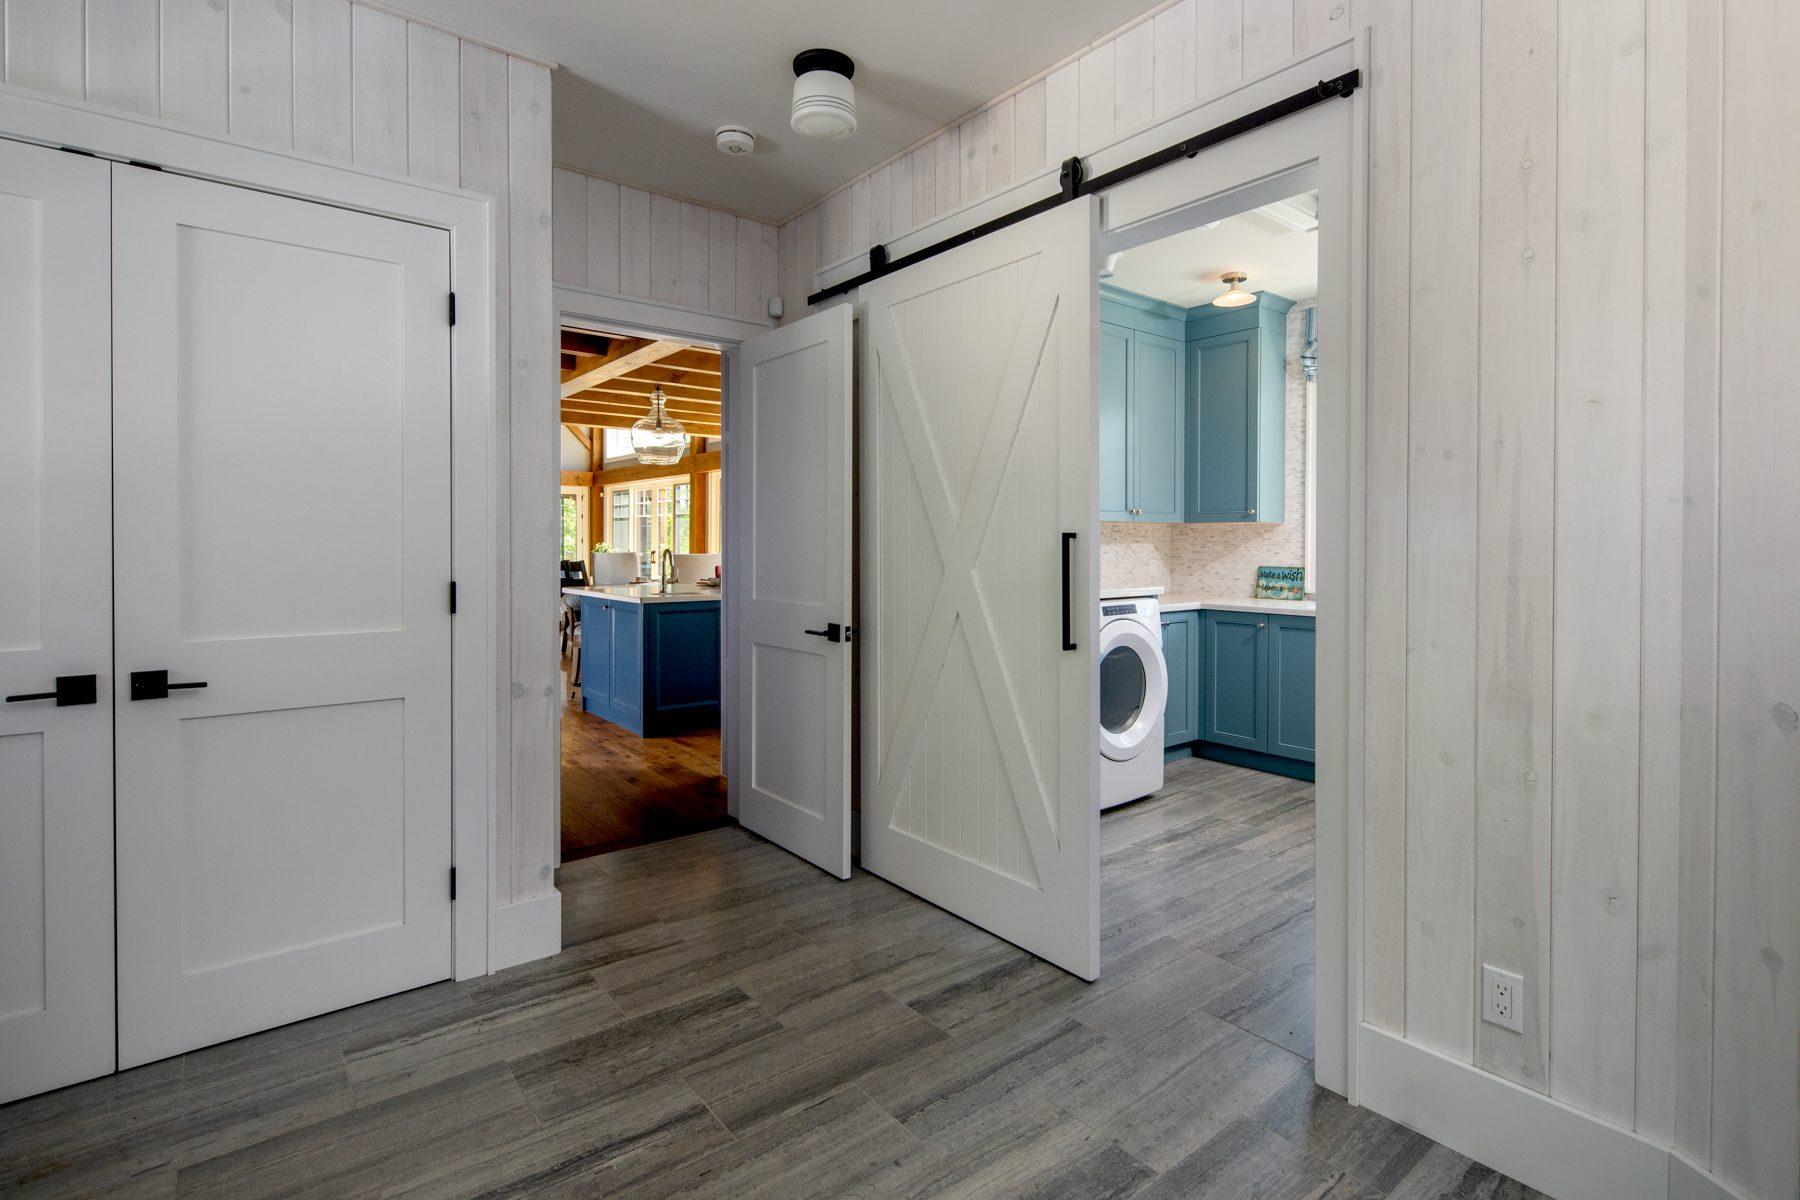 Normerica-Timber-Homes-Timber-Frame-Portfolio-Beachside-Bliss-Interior-Mudroom-Main-Floor-Laundry-Room